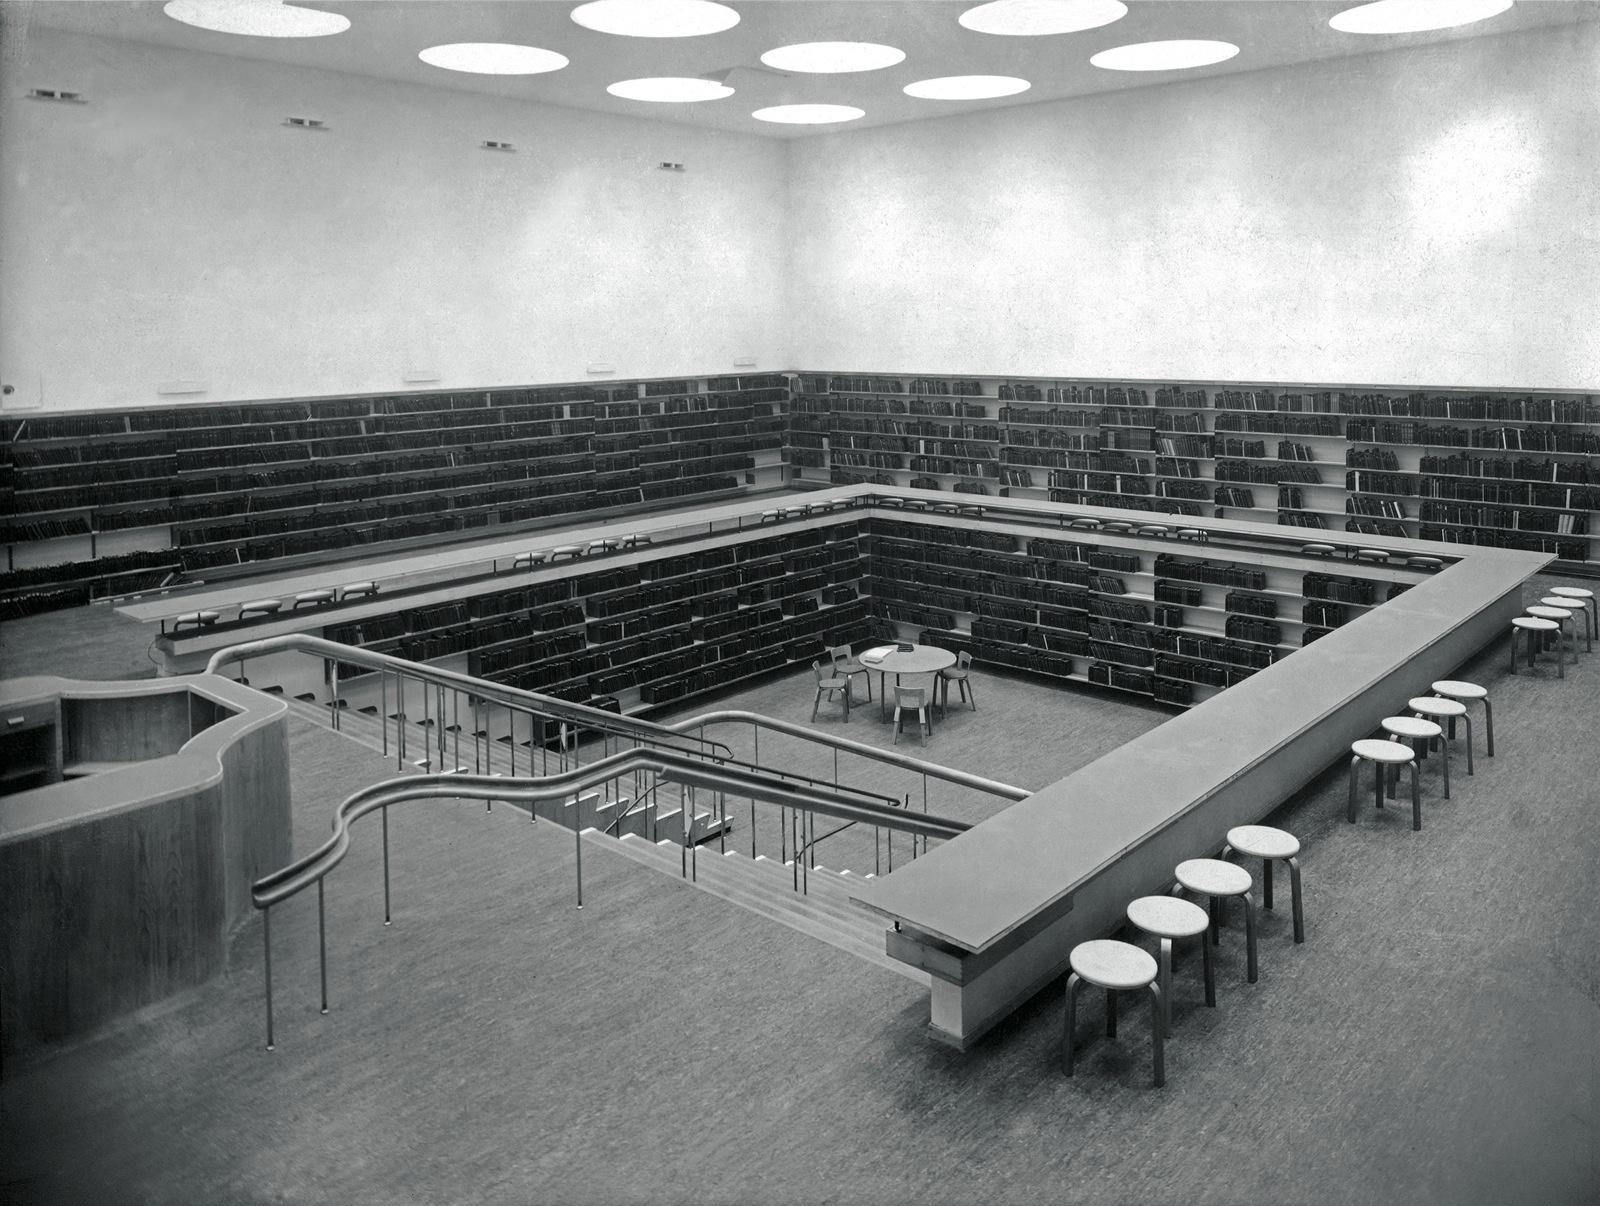 История дизайна: Айно и Алвар Аалто (галерея 13, фото 5)